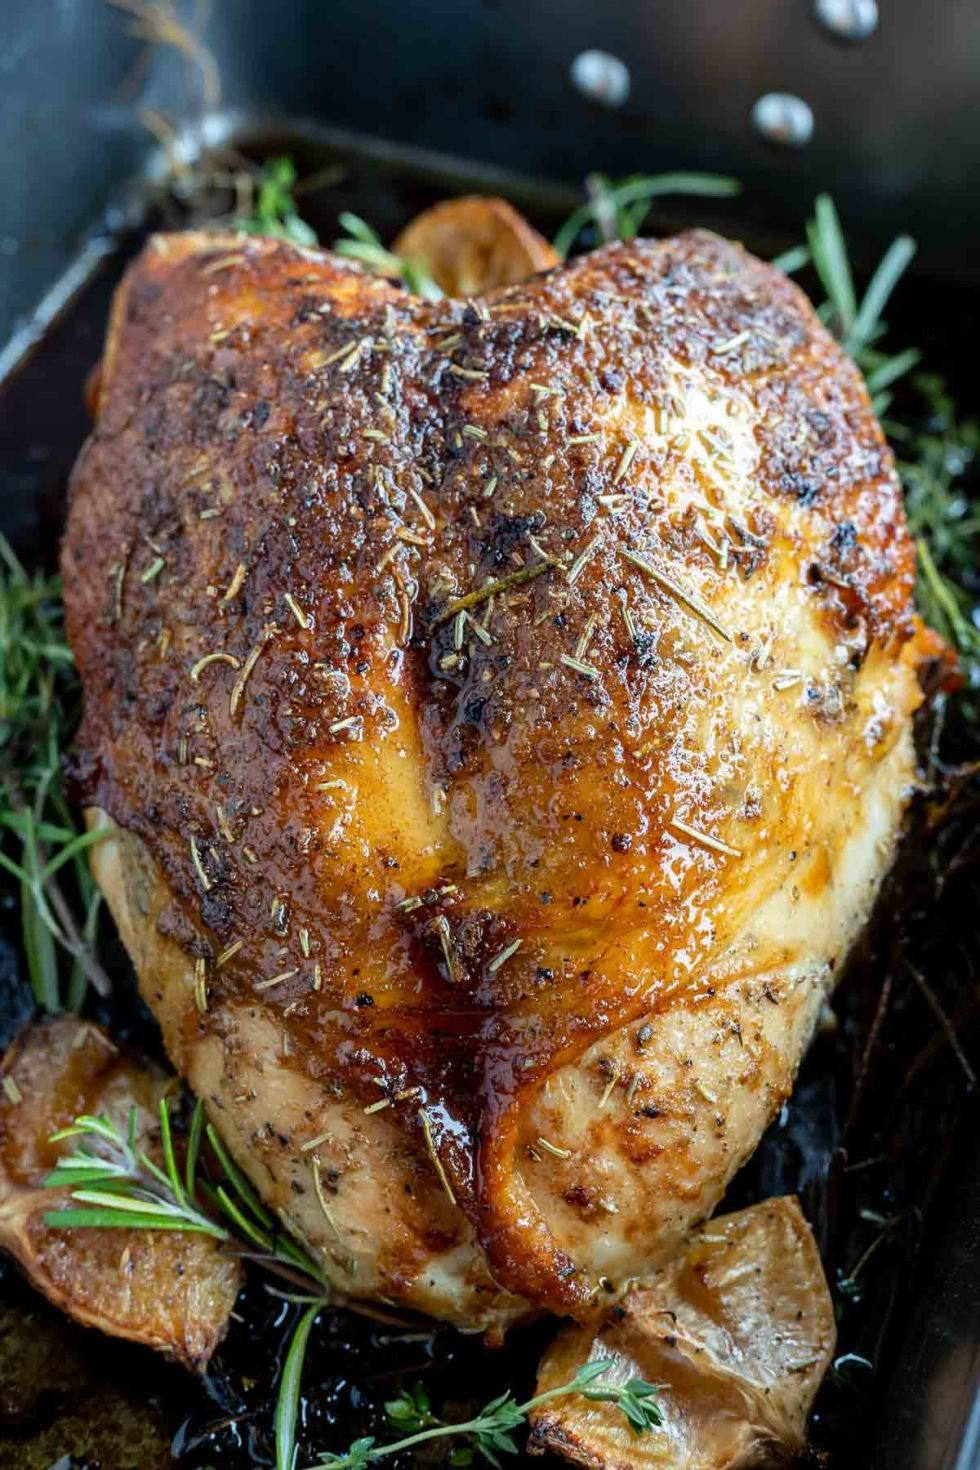 deep brown cooked turkey breast with herbs in roasting pan